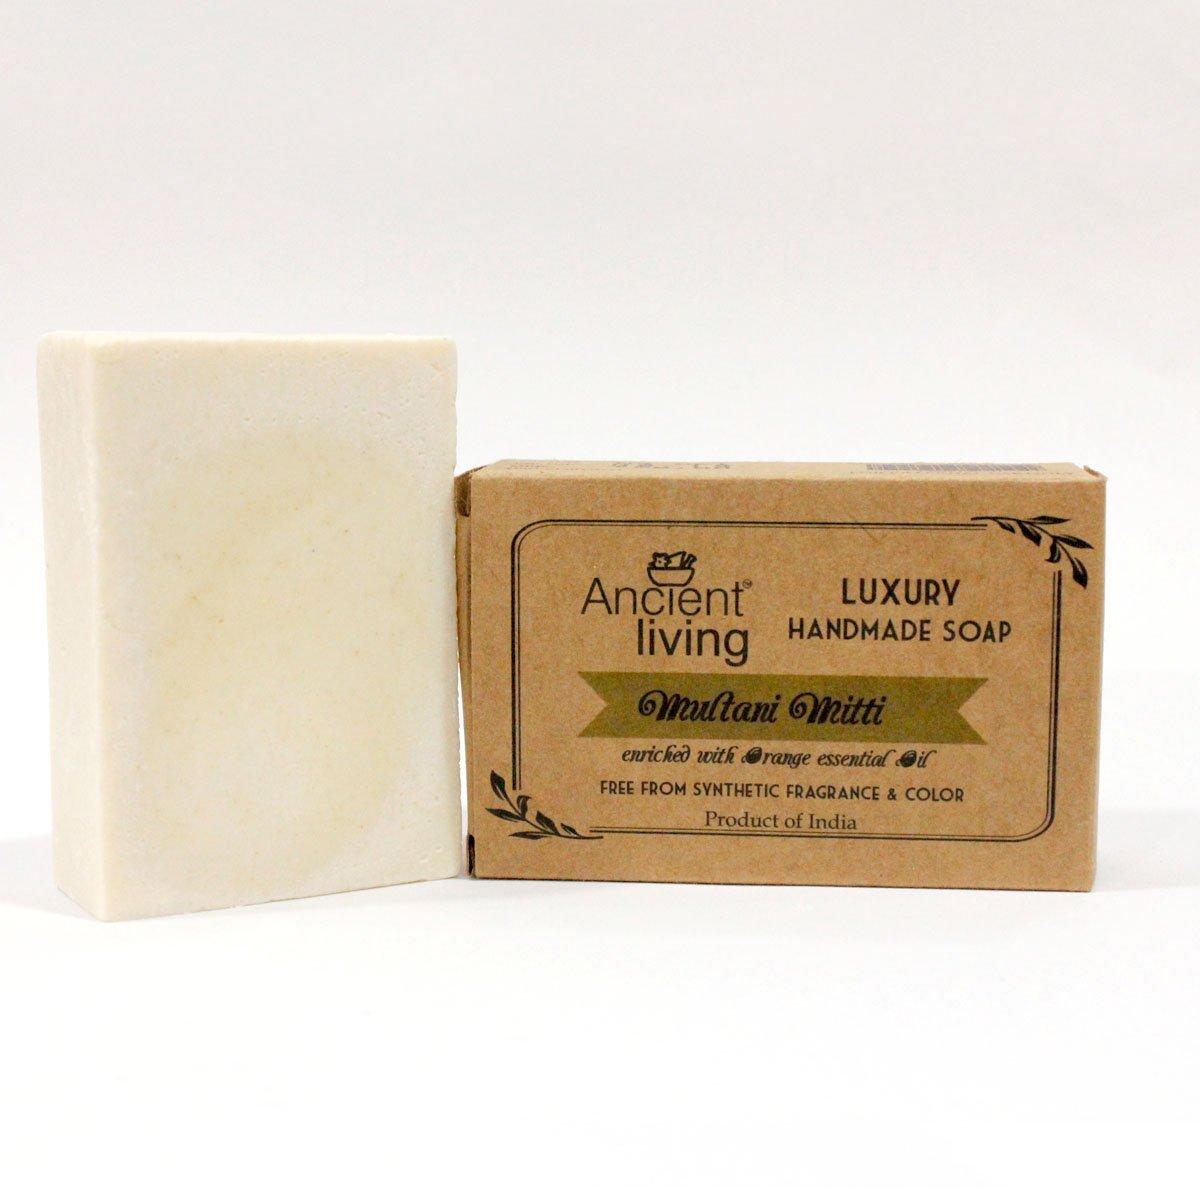 Ancient Living Multanimitti Luxury Handmade Soap